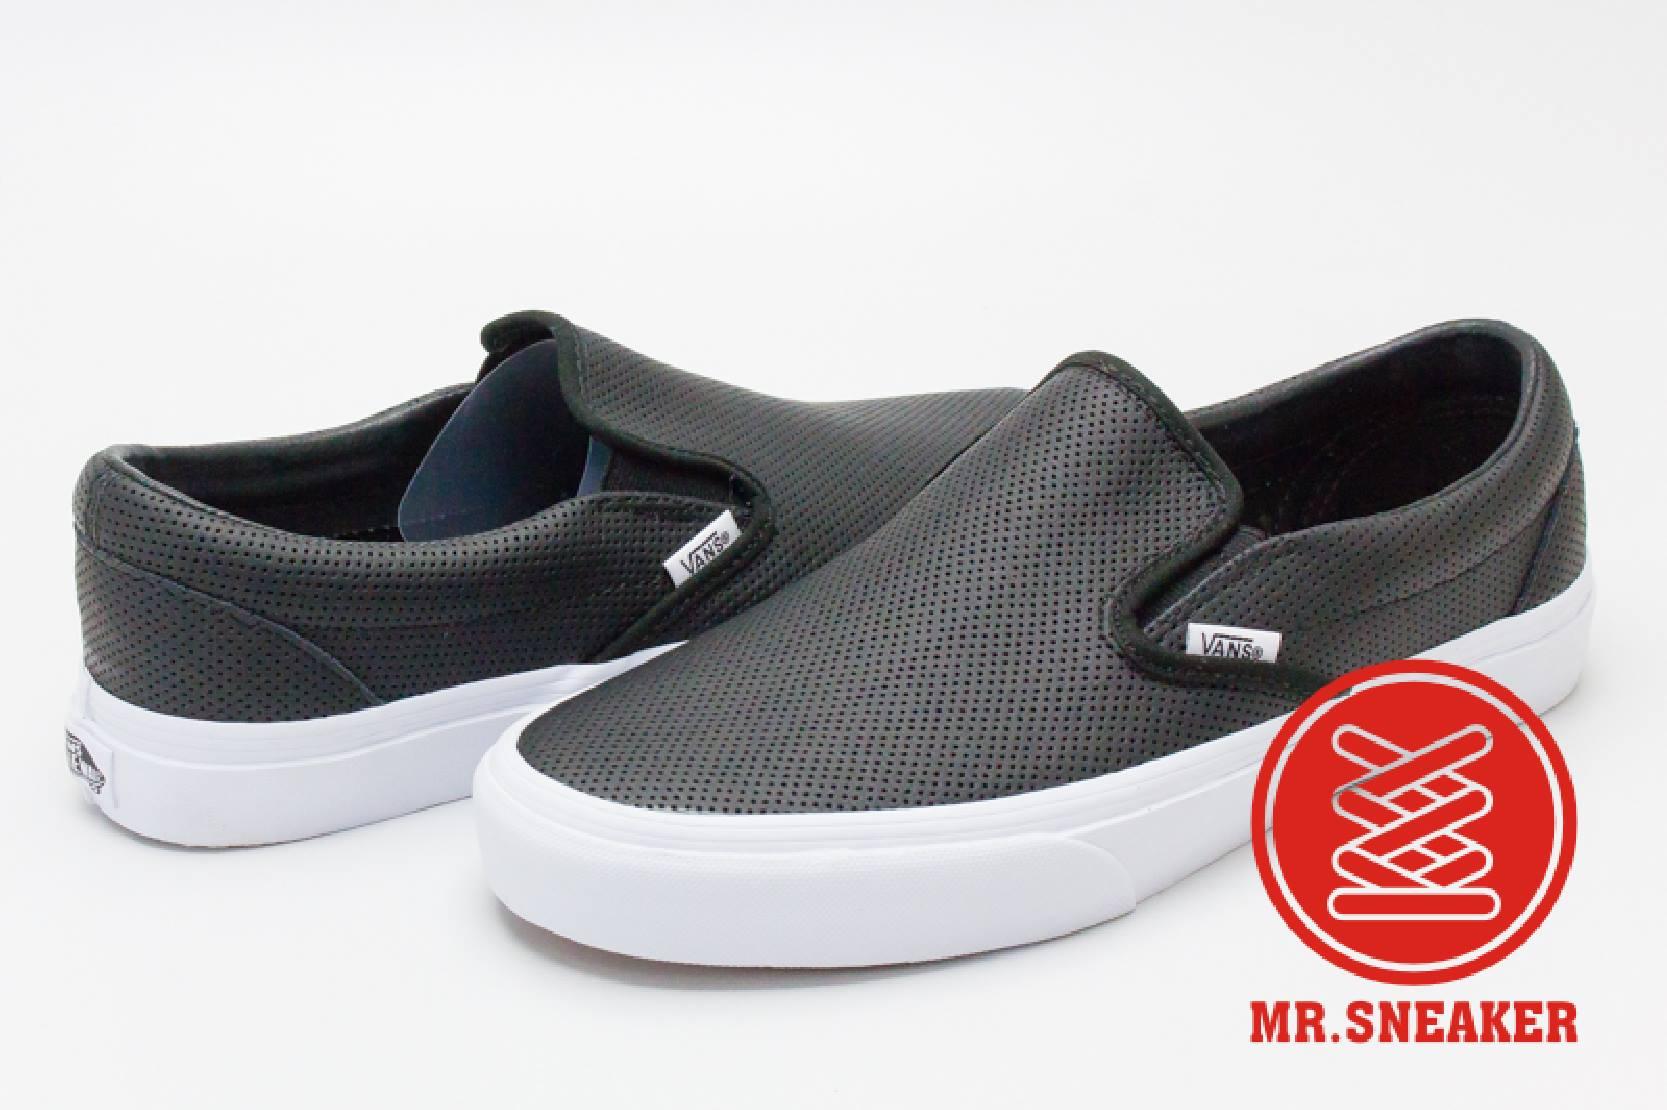 ☆Mr.Sneaker☆ VANS Slip On 網眼 洞洞 皮革 基本款 黑、白 兩色 男女款